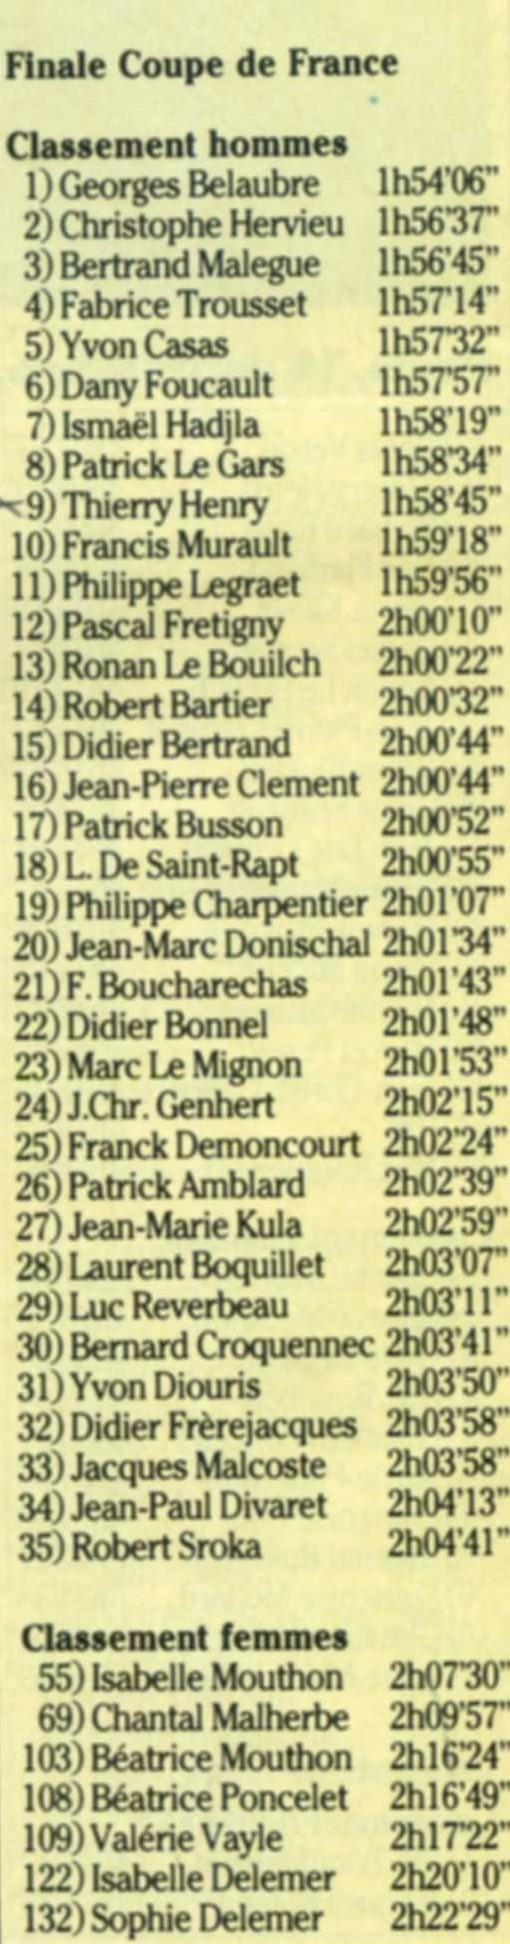 img[A]15421-septembre-1986_nantes_résultats_3